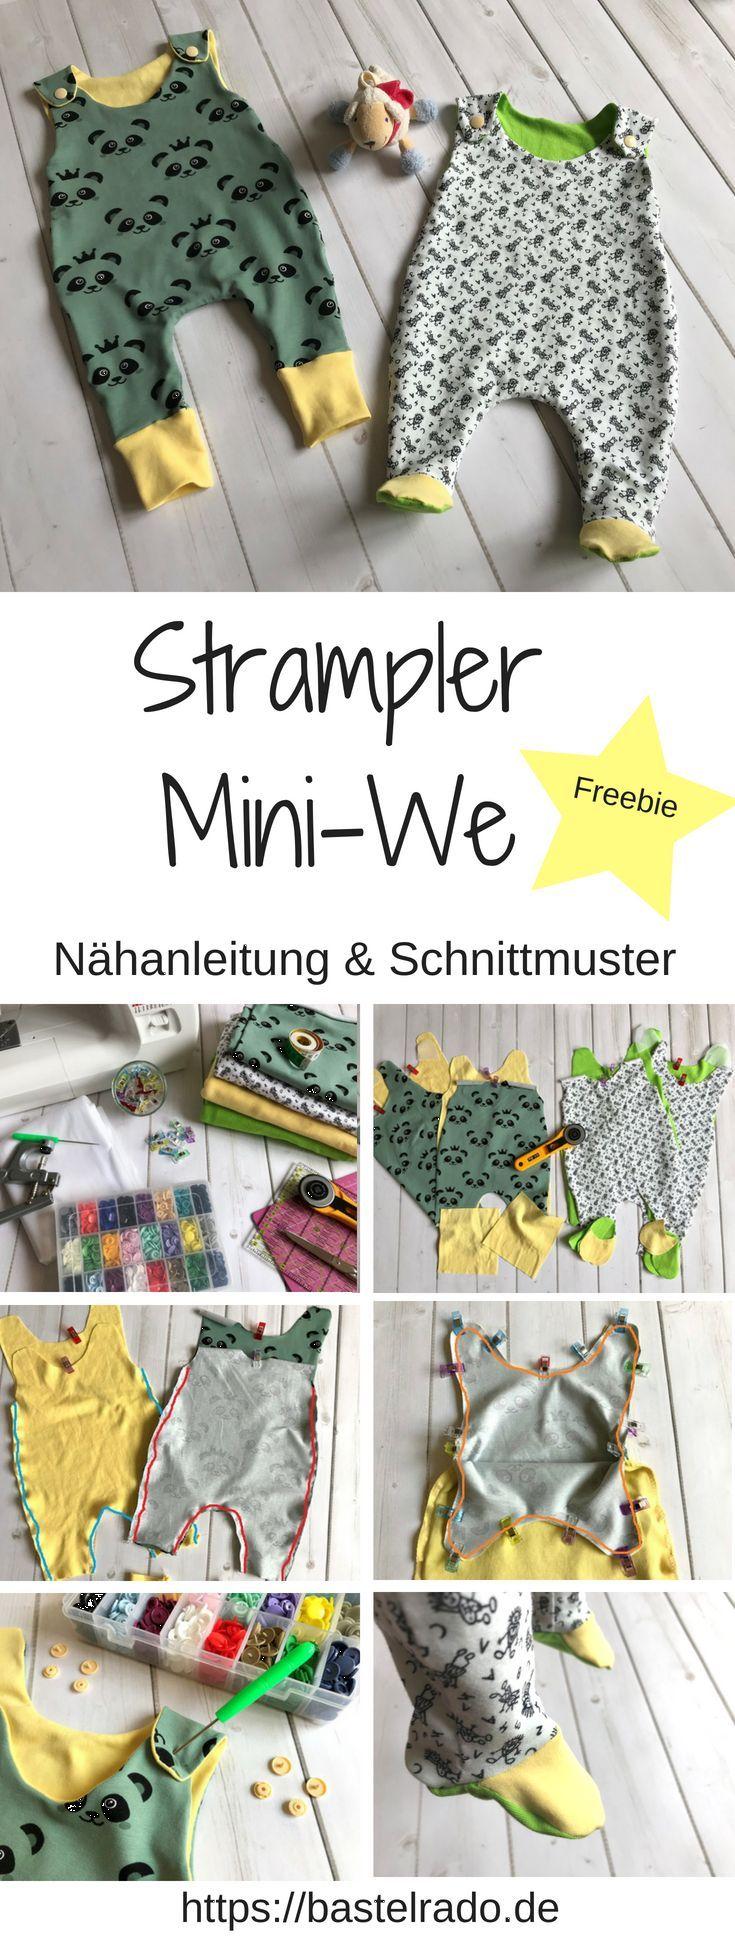 Strampler Mini-We – Nähanleitung inkl. Schnittmuster